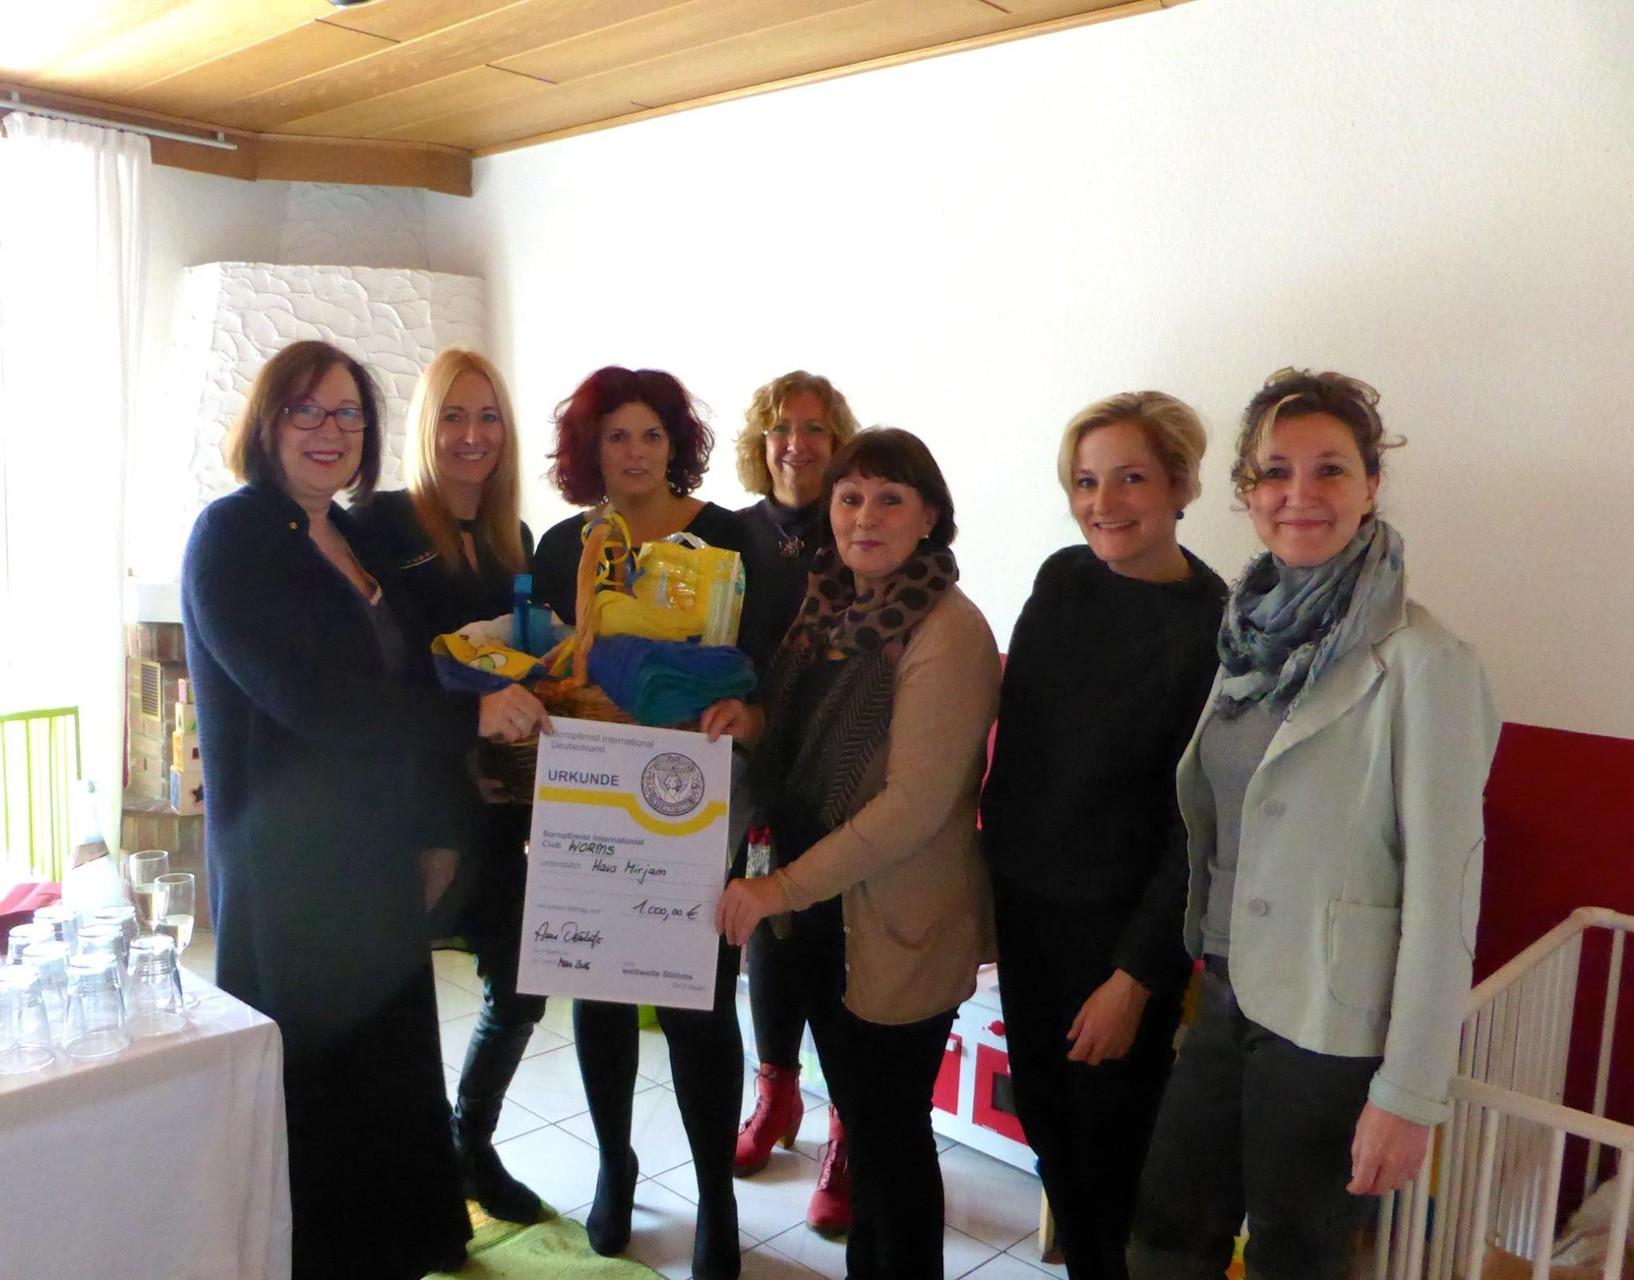 2016 03 Spendenübergabe Haus Mirjam